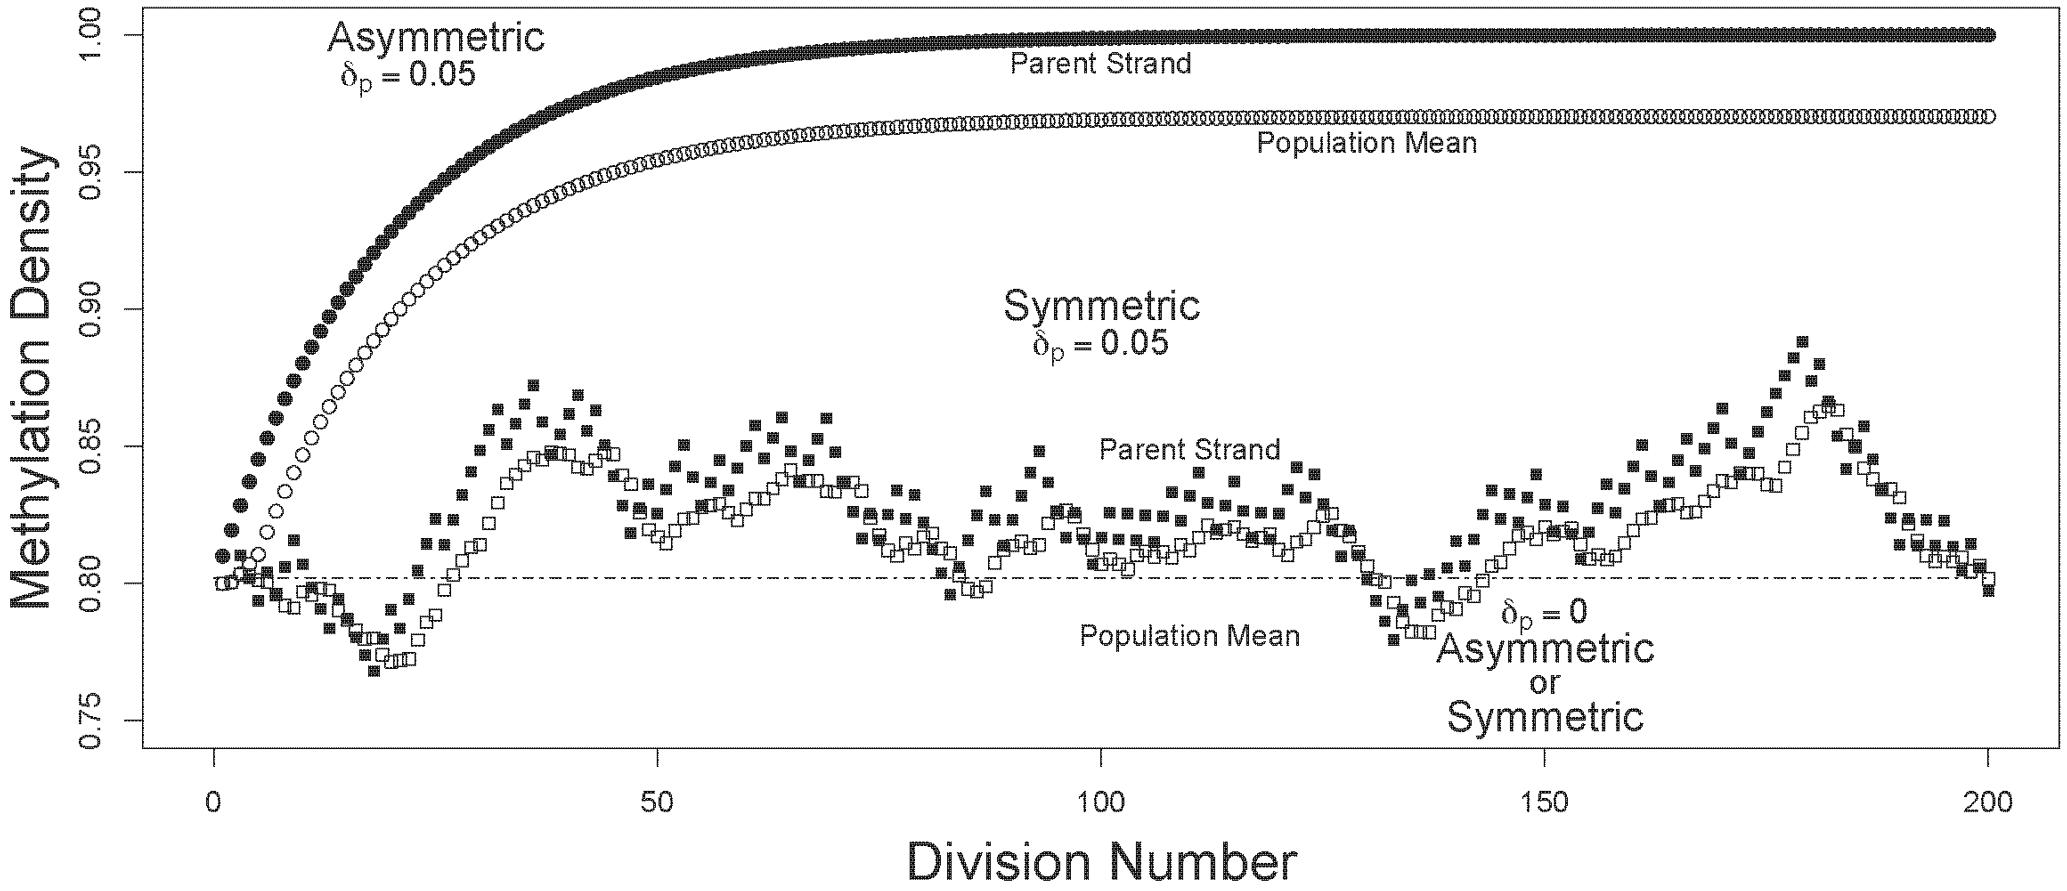 Trajectories of methylation densities under asymmetric or symmetric strand segregation, with high initial methylation density.